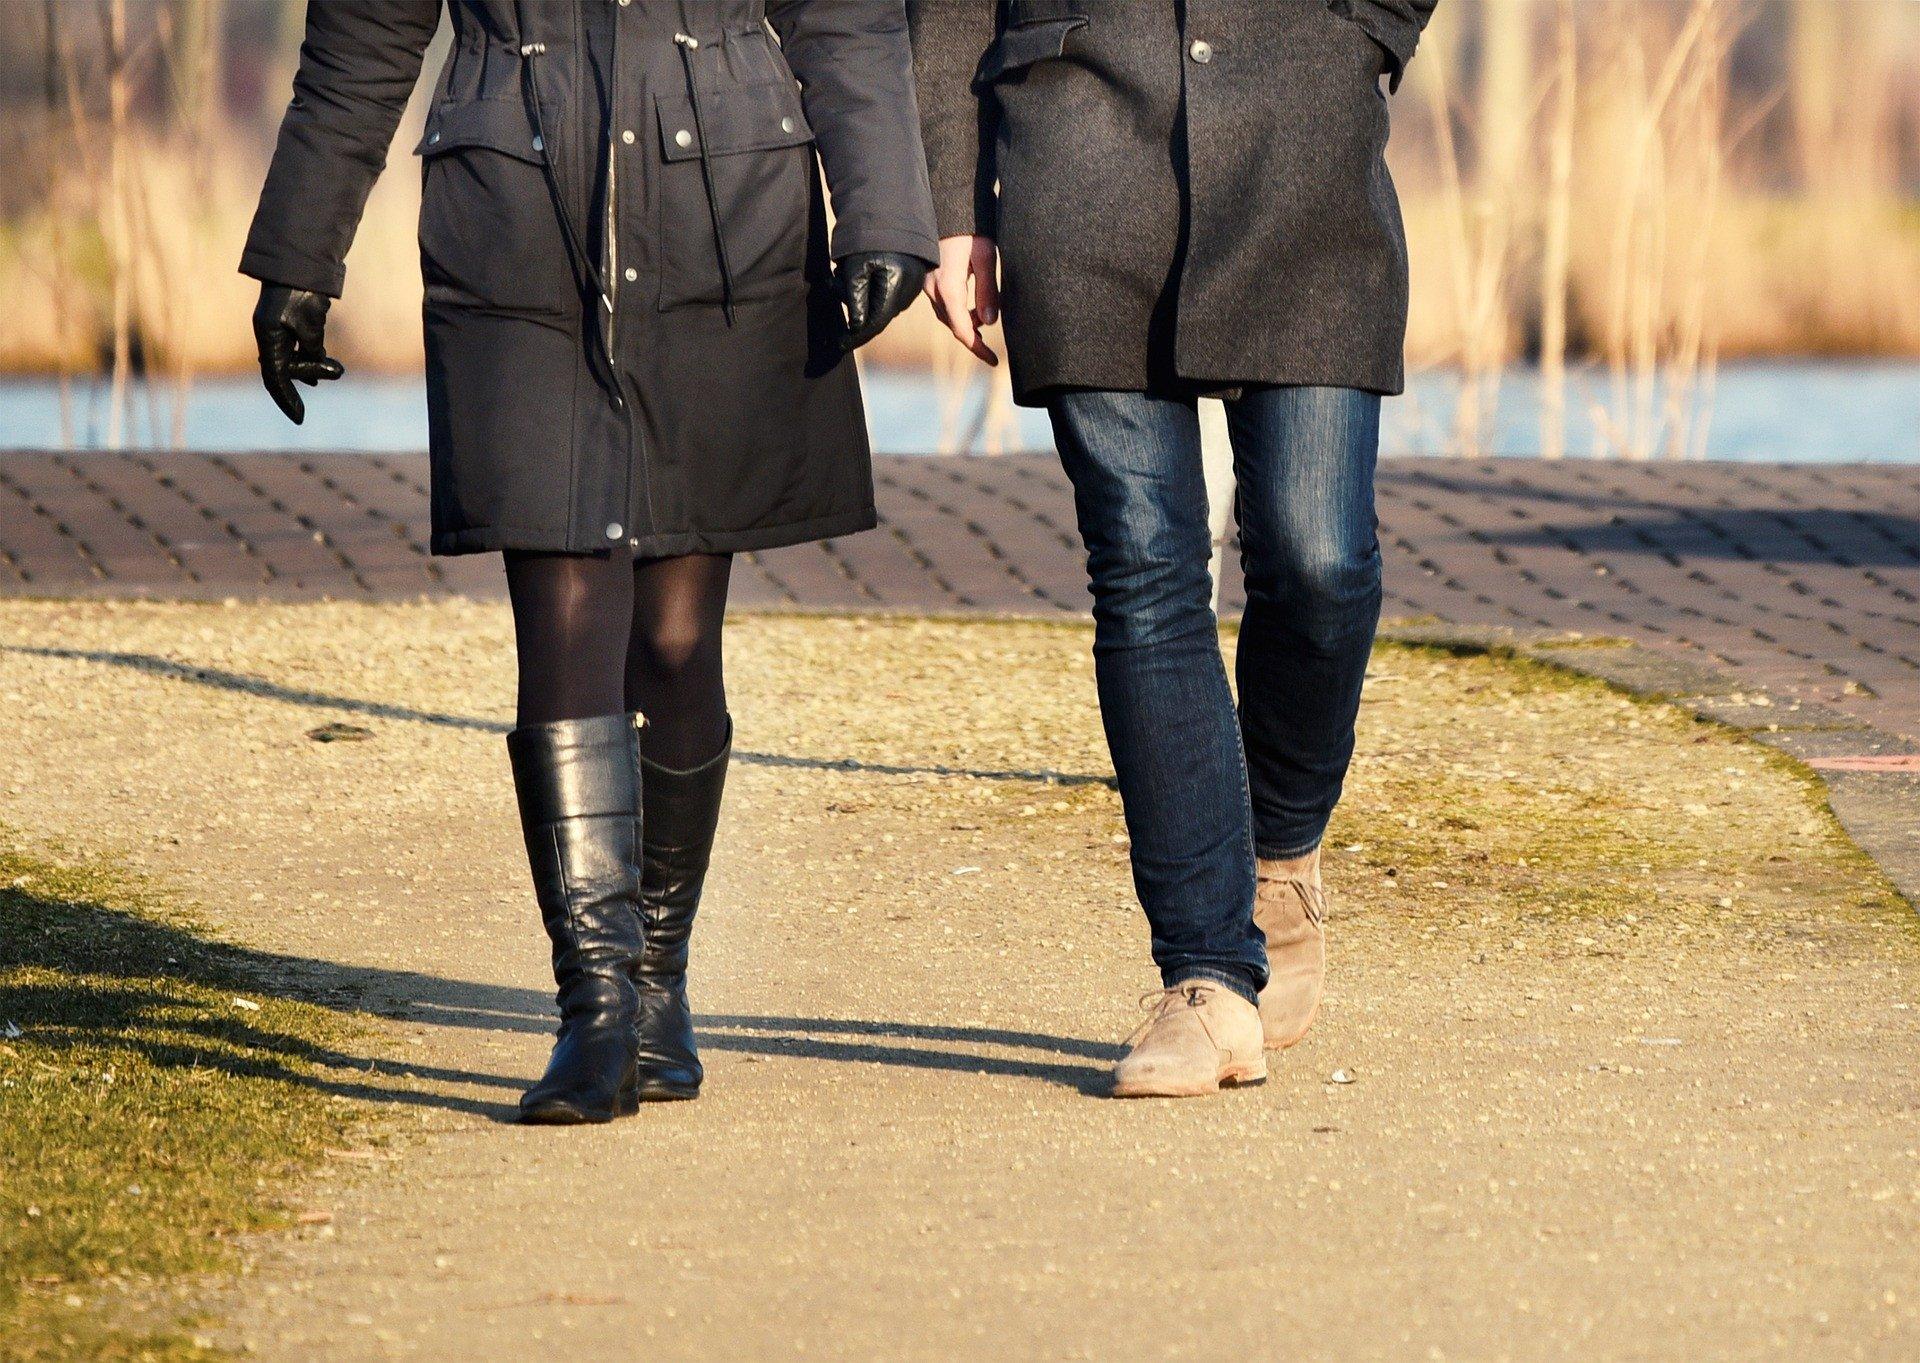 Curiga Pasangan Selingkuh, Ungkap Saja dengan 7 Pertanyaan Ini - JPNN.com